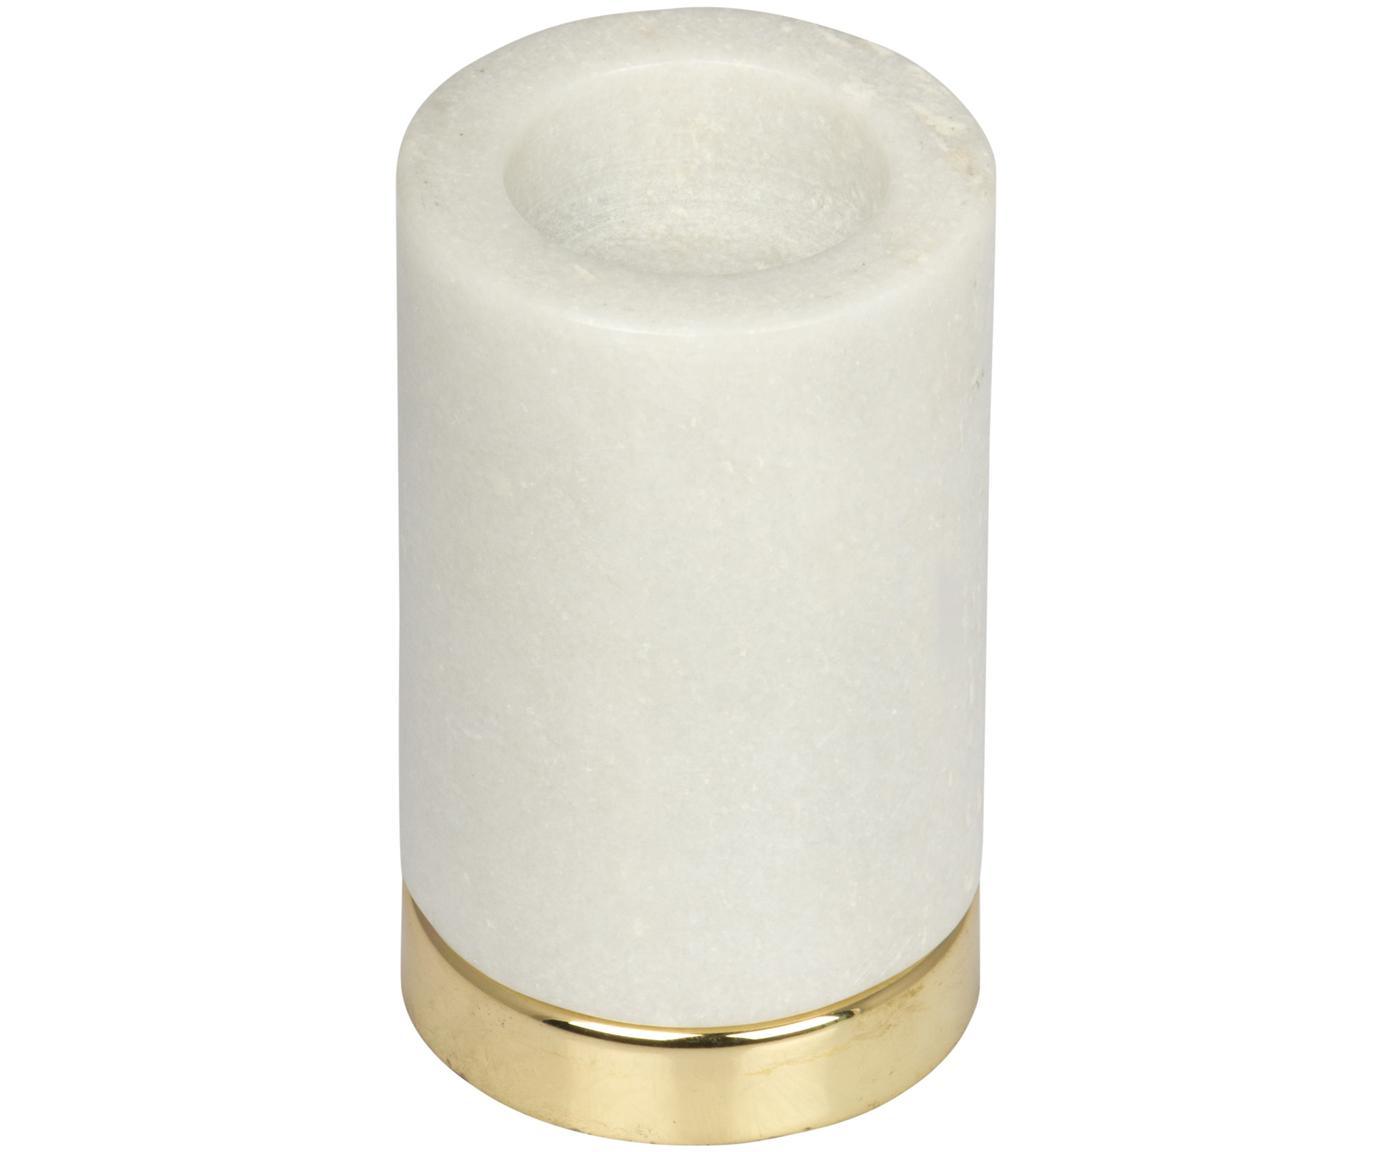 Teelichthalter Porter, Sockel: Metall, vermessingt, Kerzenhalter: Marmor, Weiss, Messing, Ø 7 x H 11 cm